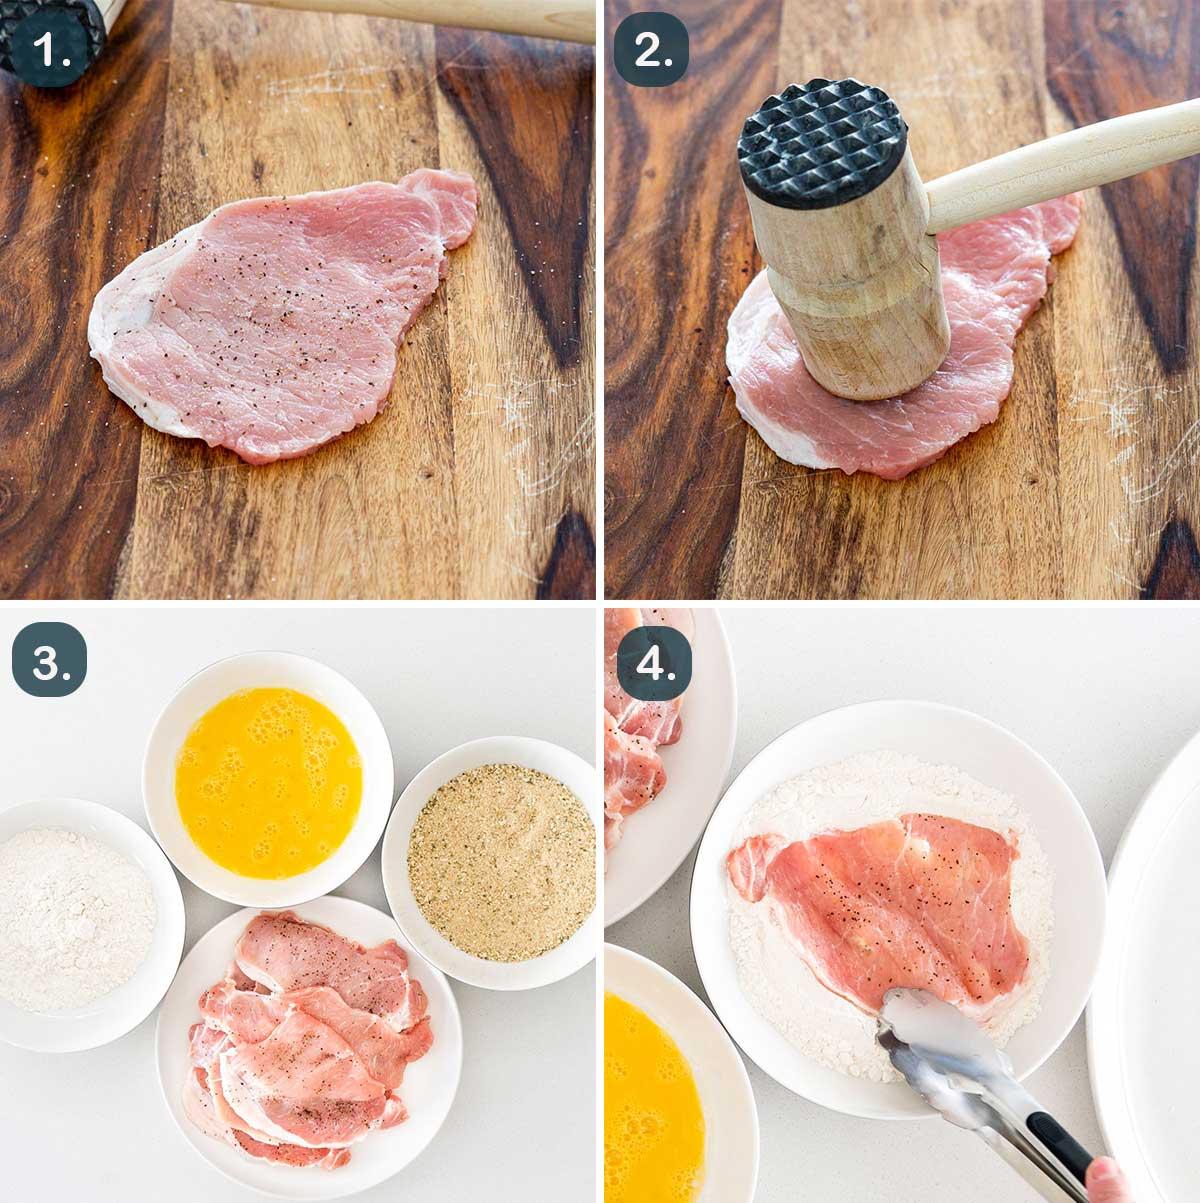 process shots showing how to prep pork chops to make pork schnitzel.